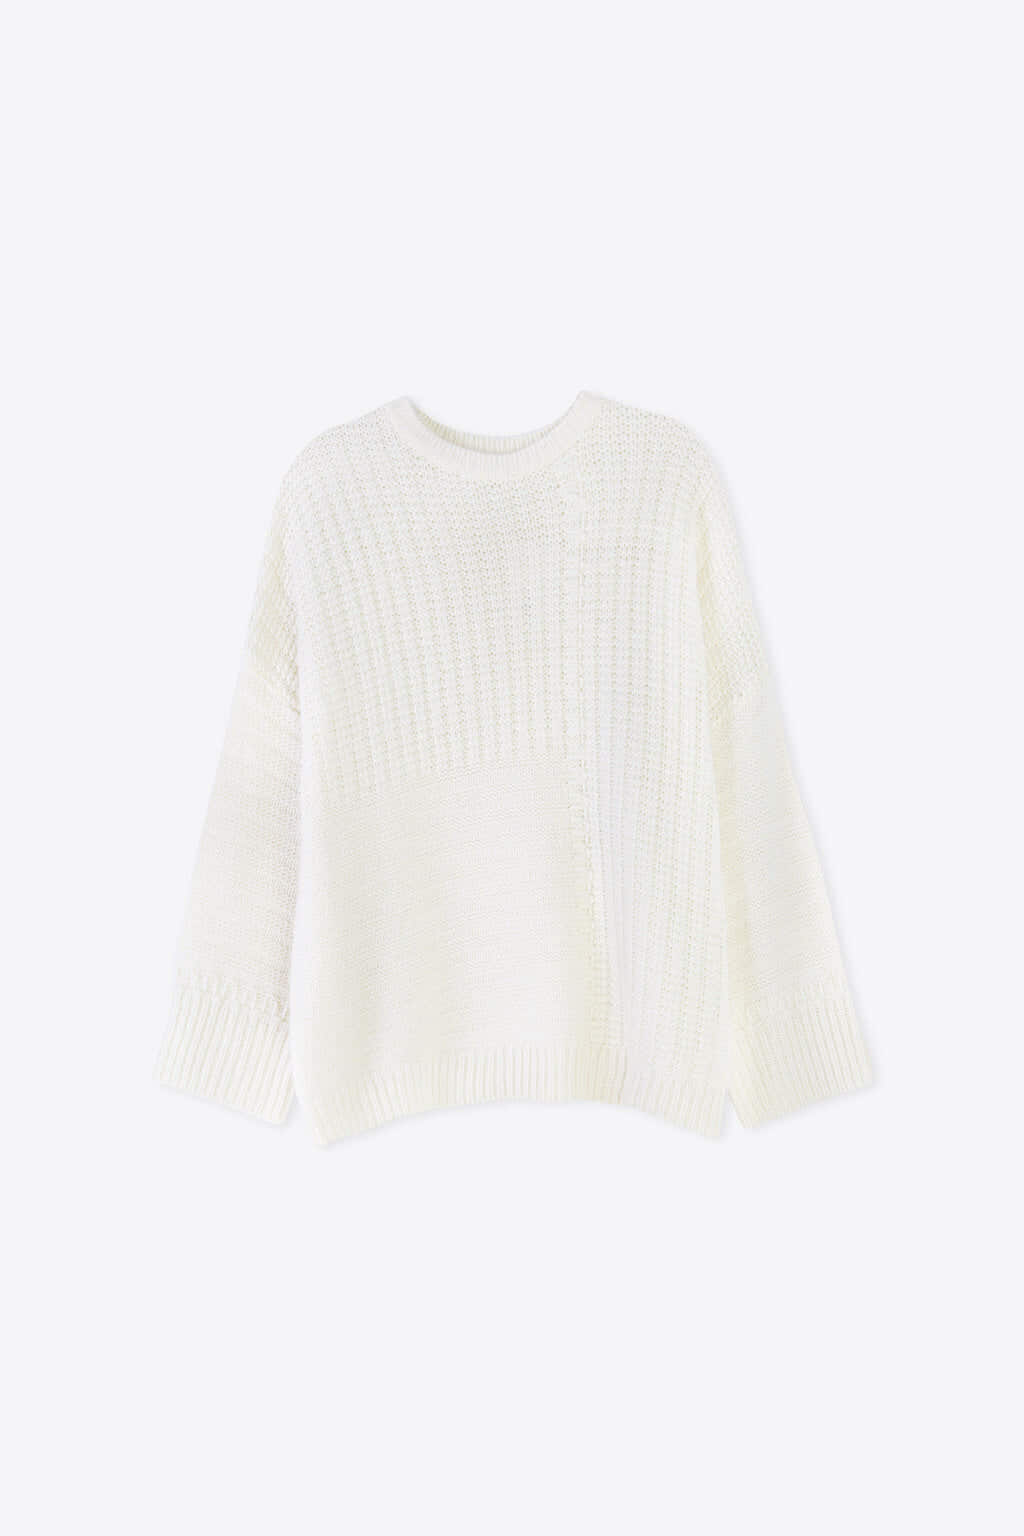 Sweater 2523 Cream 5